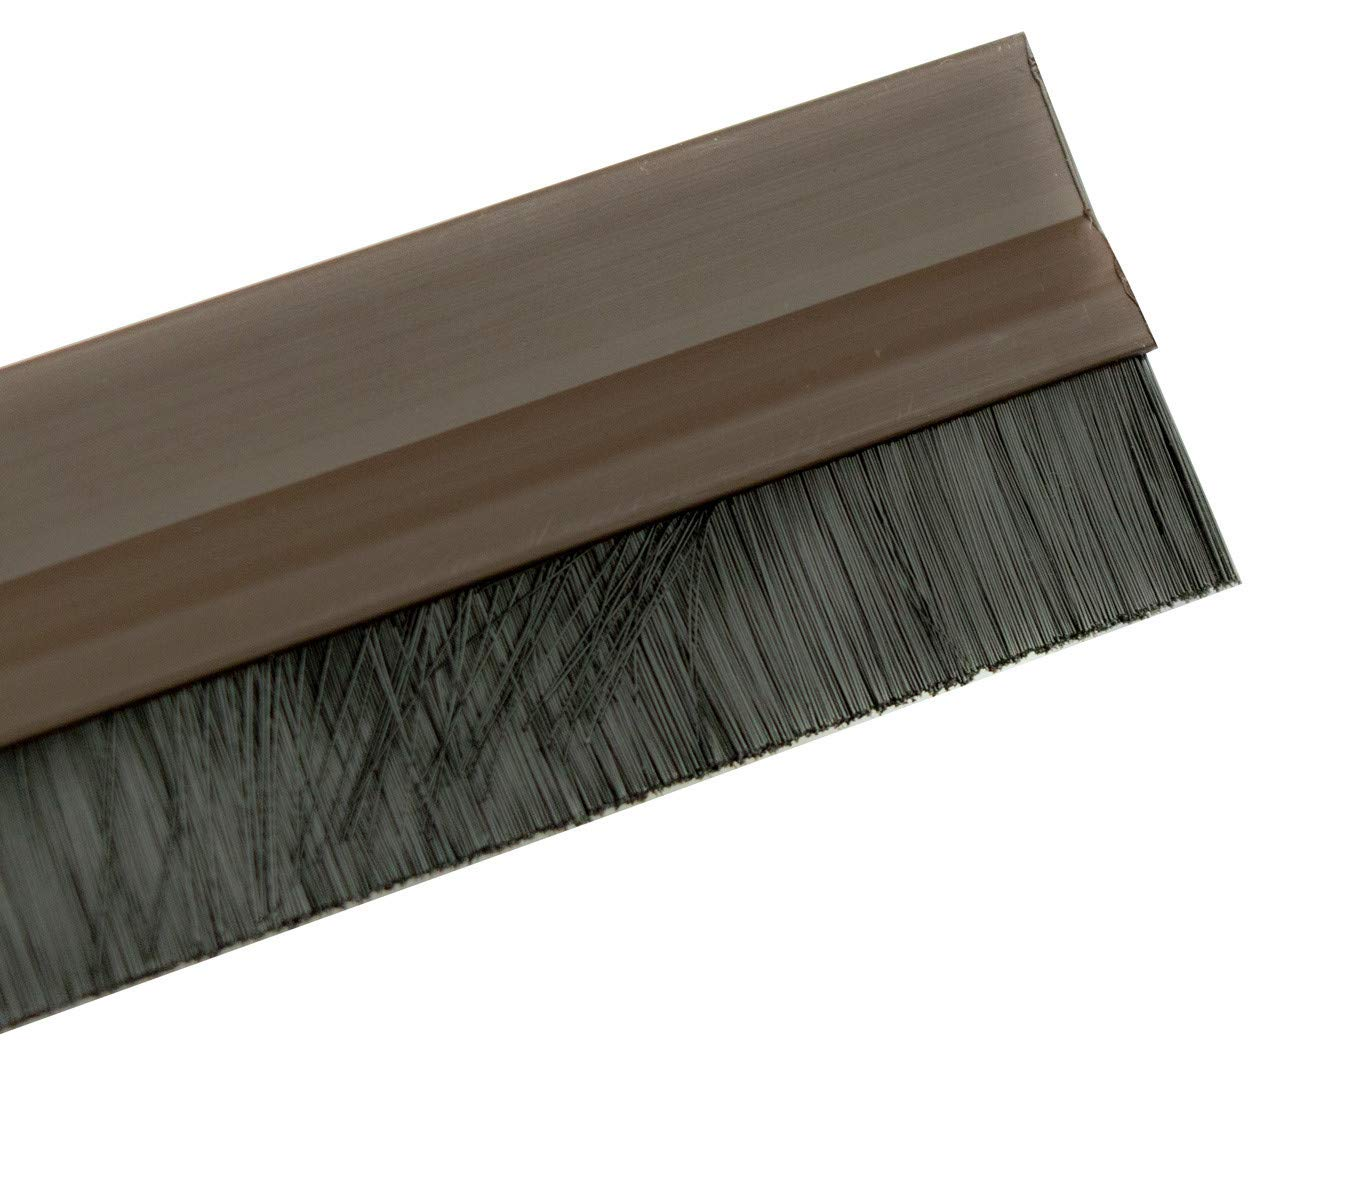 1400 Cubre ranuras con pegatina adhesiva en tres colores anti-insecto 100x4.5 cm Marr/ón